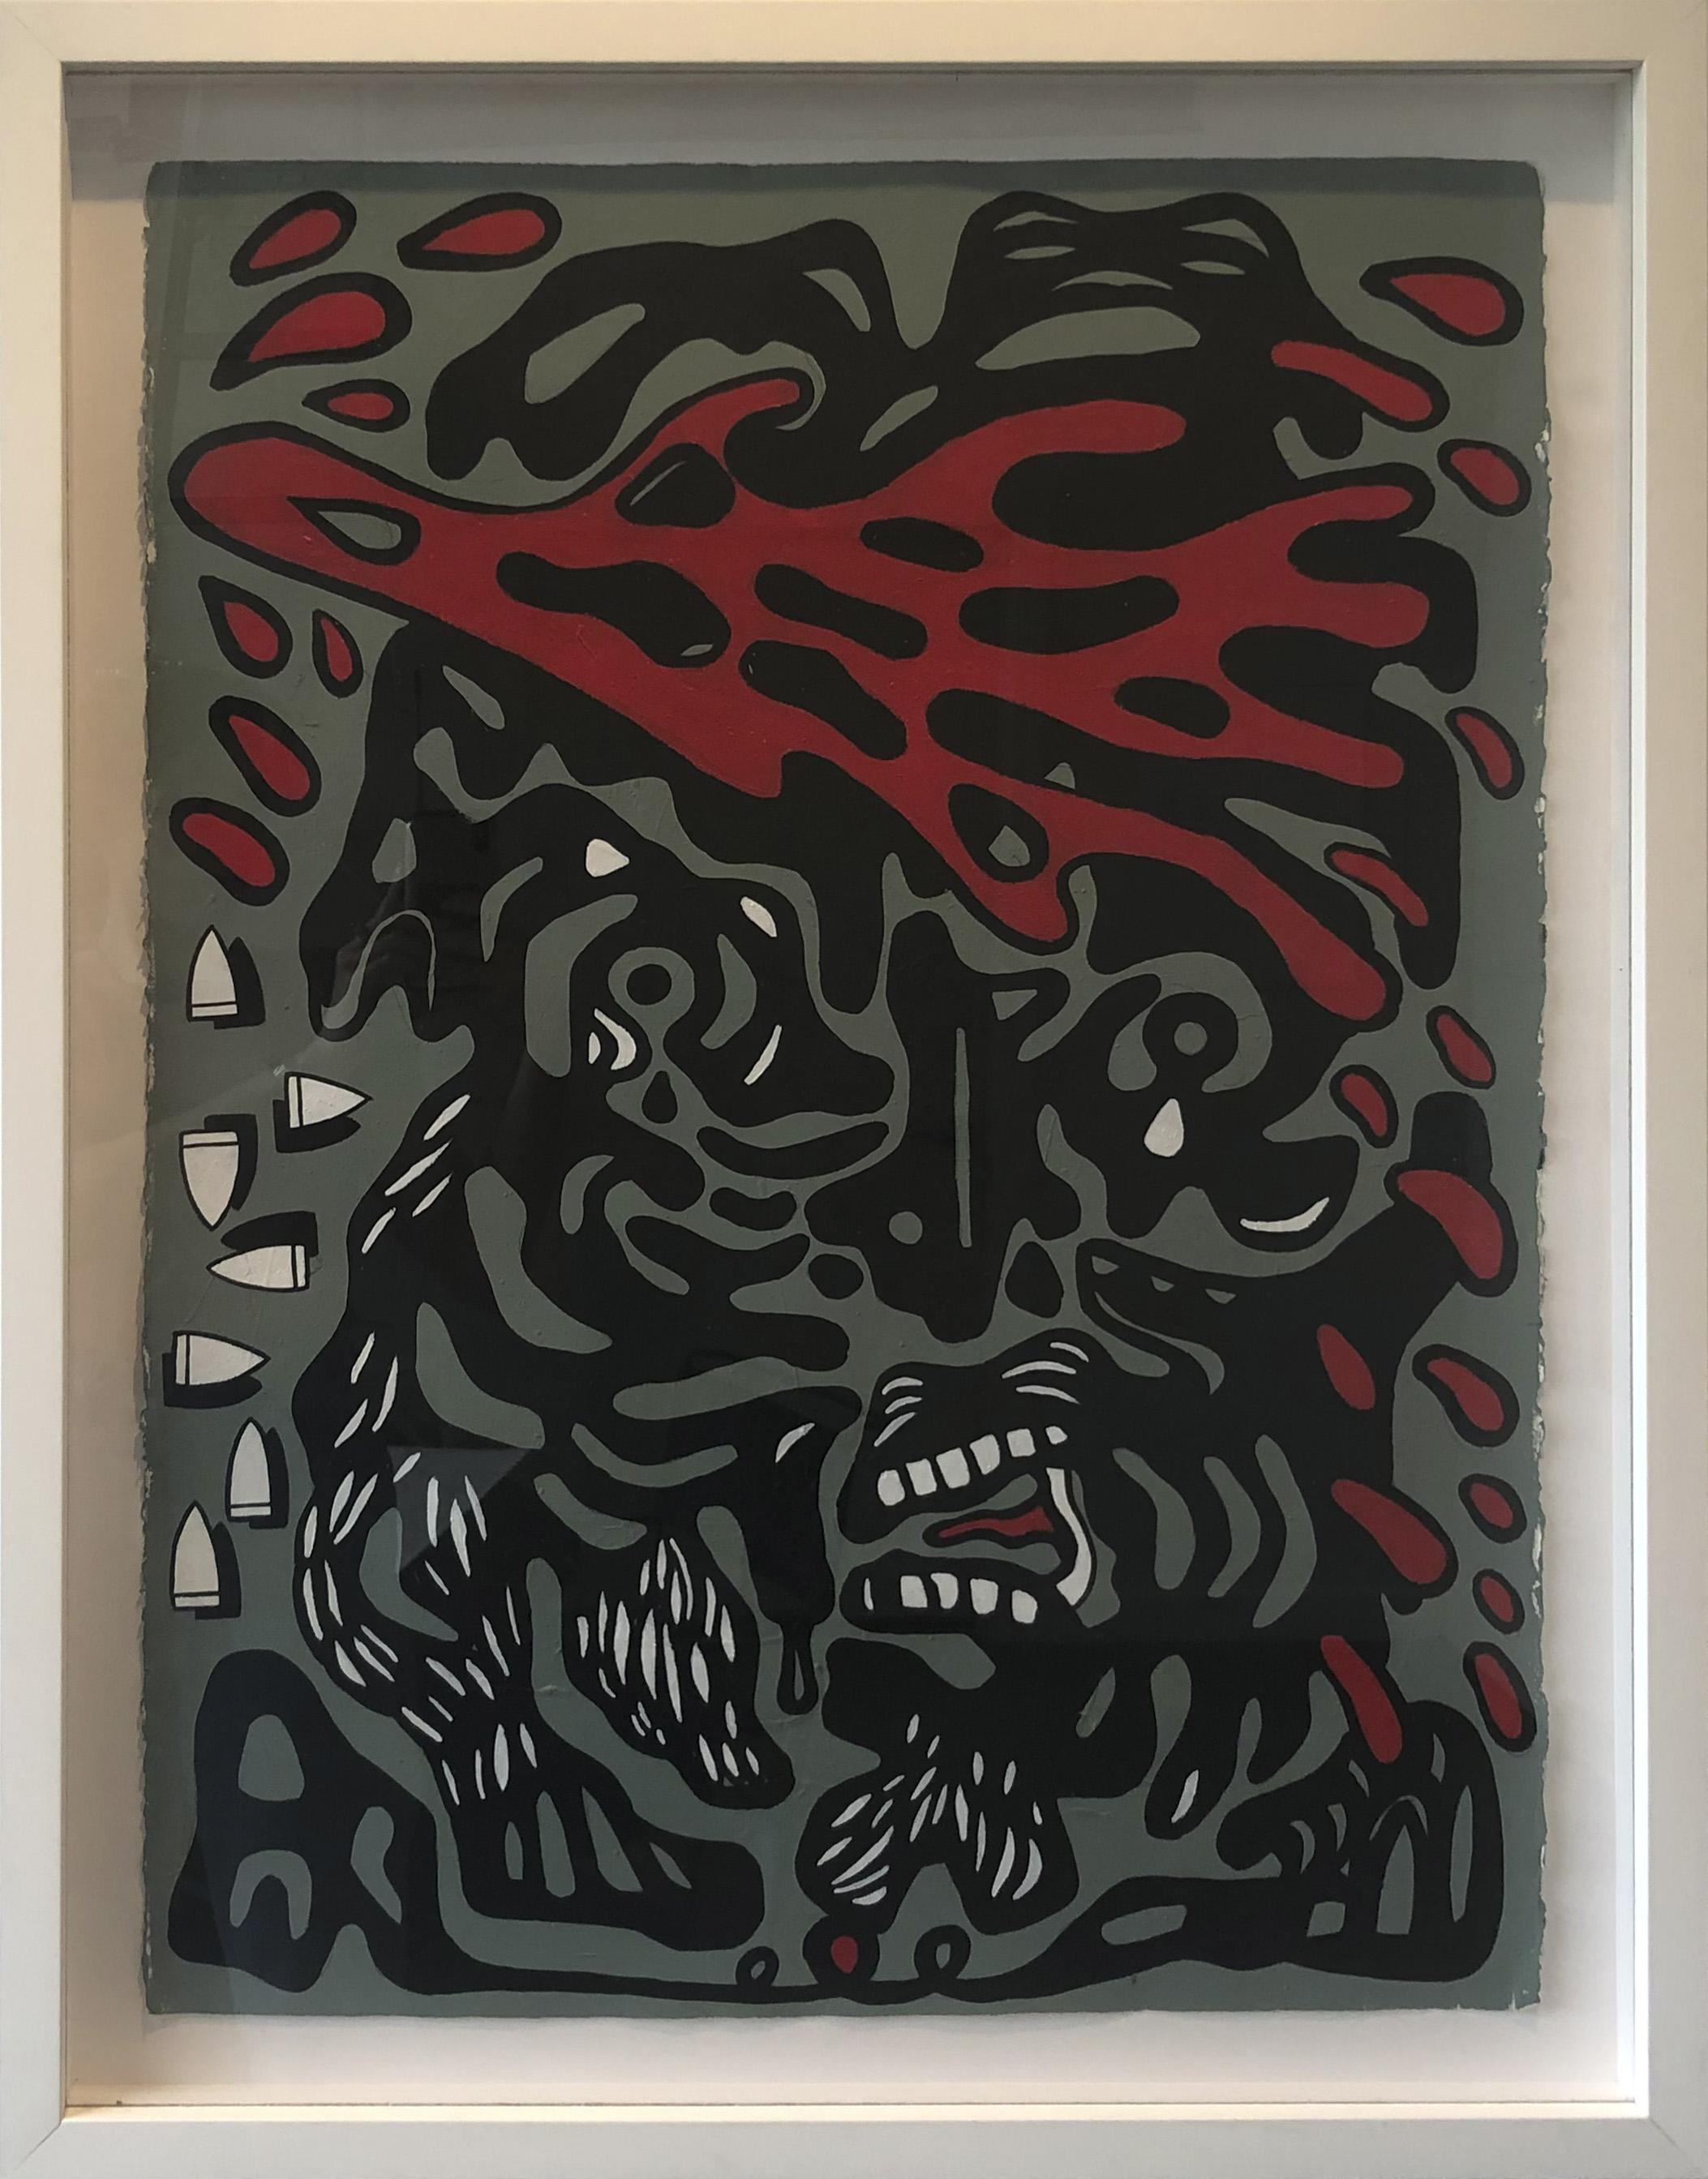 Cabeza 3,  2018  Acrylic on paper  30 x 22 in.